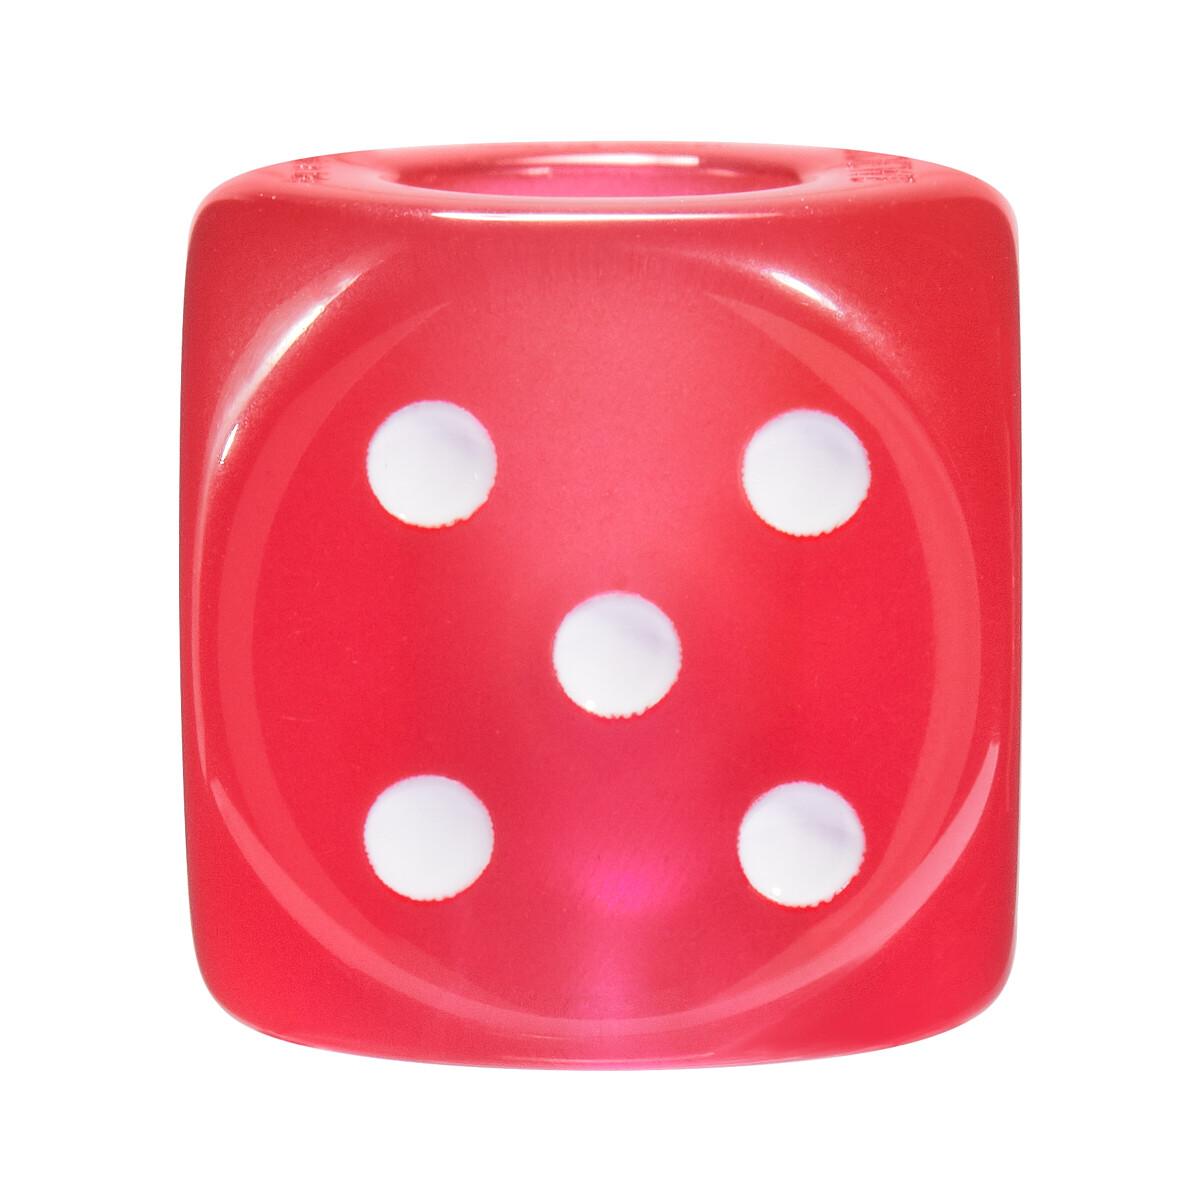 LOEWE 大号游戏骰子挂饰 红色 front